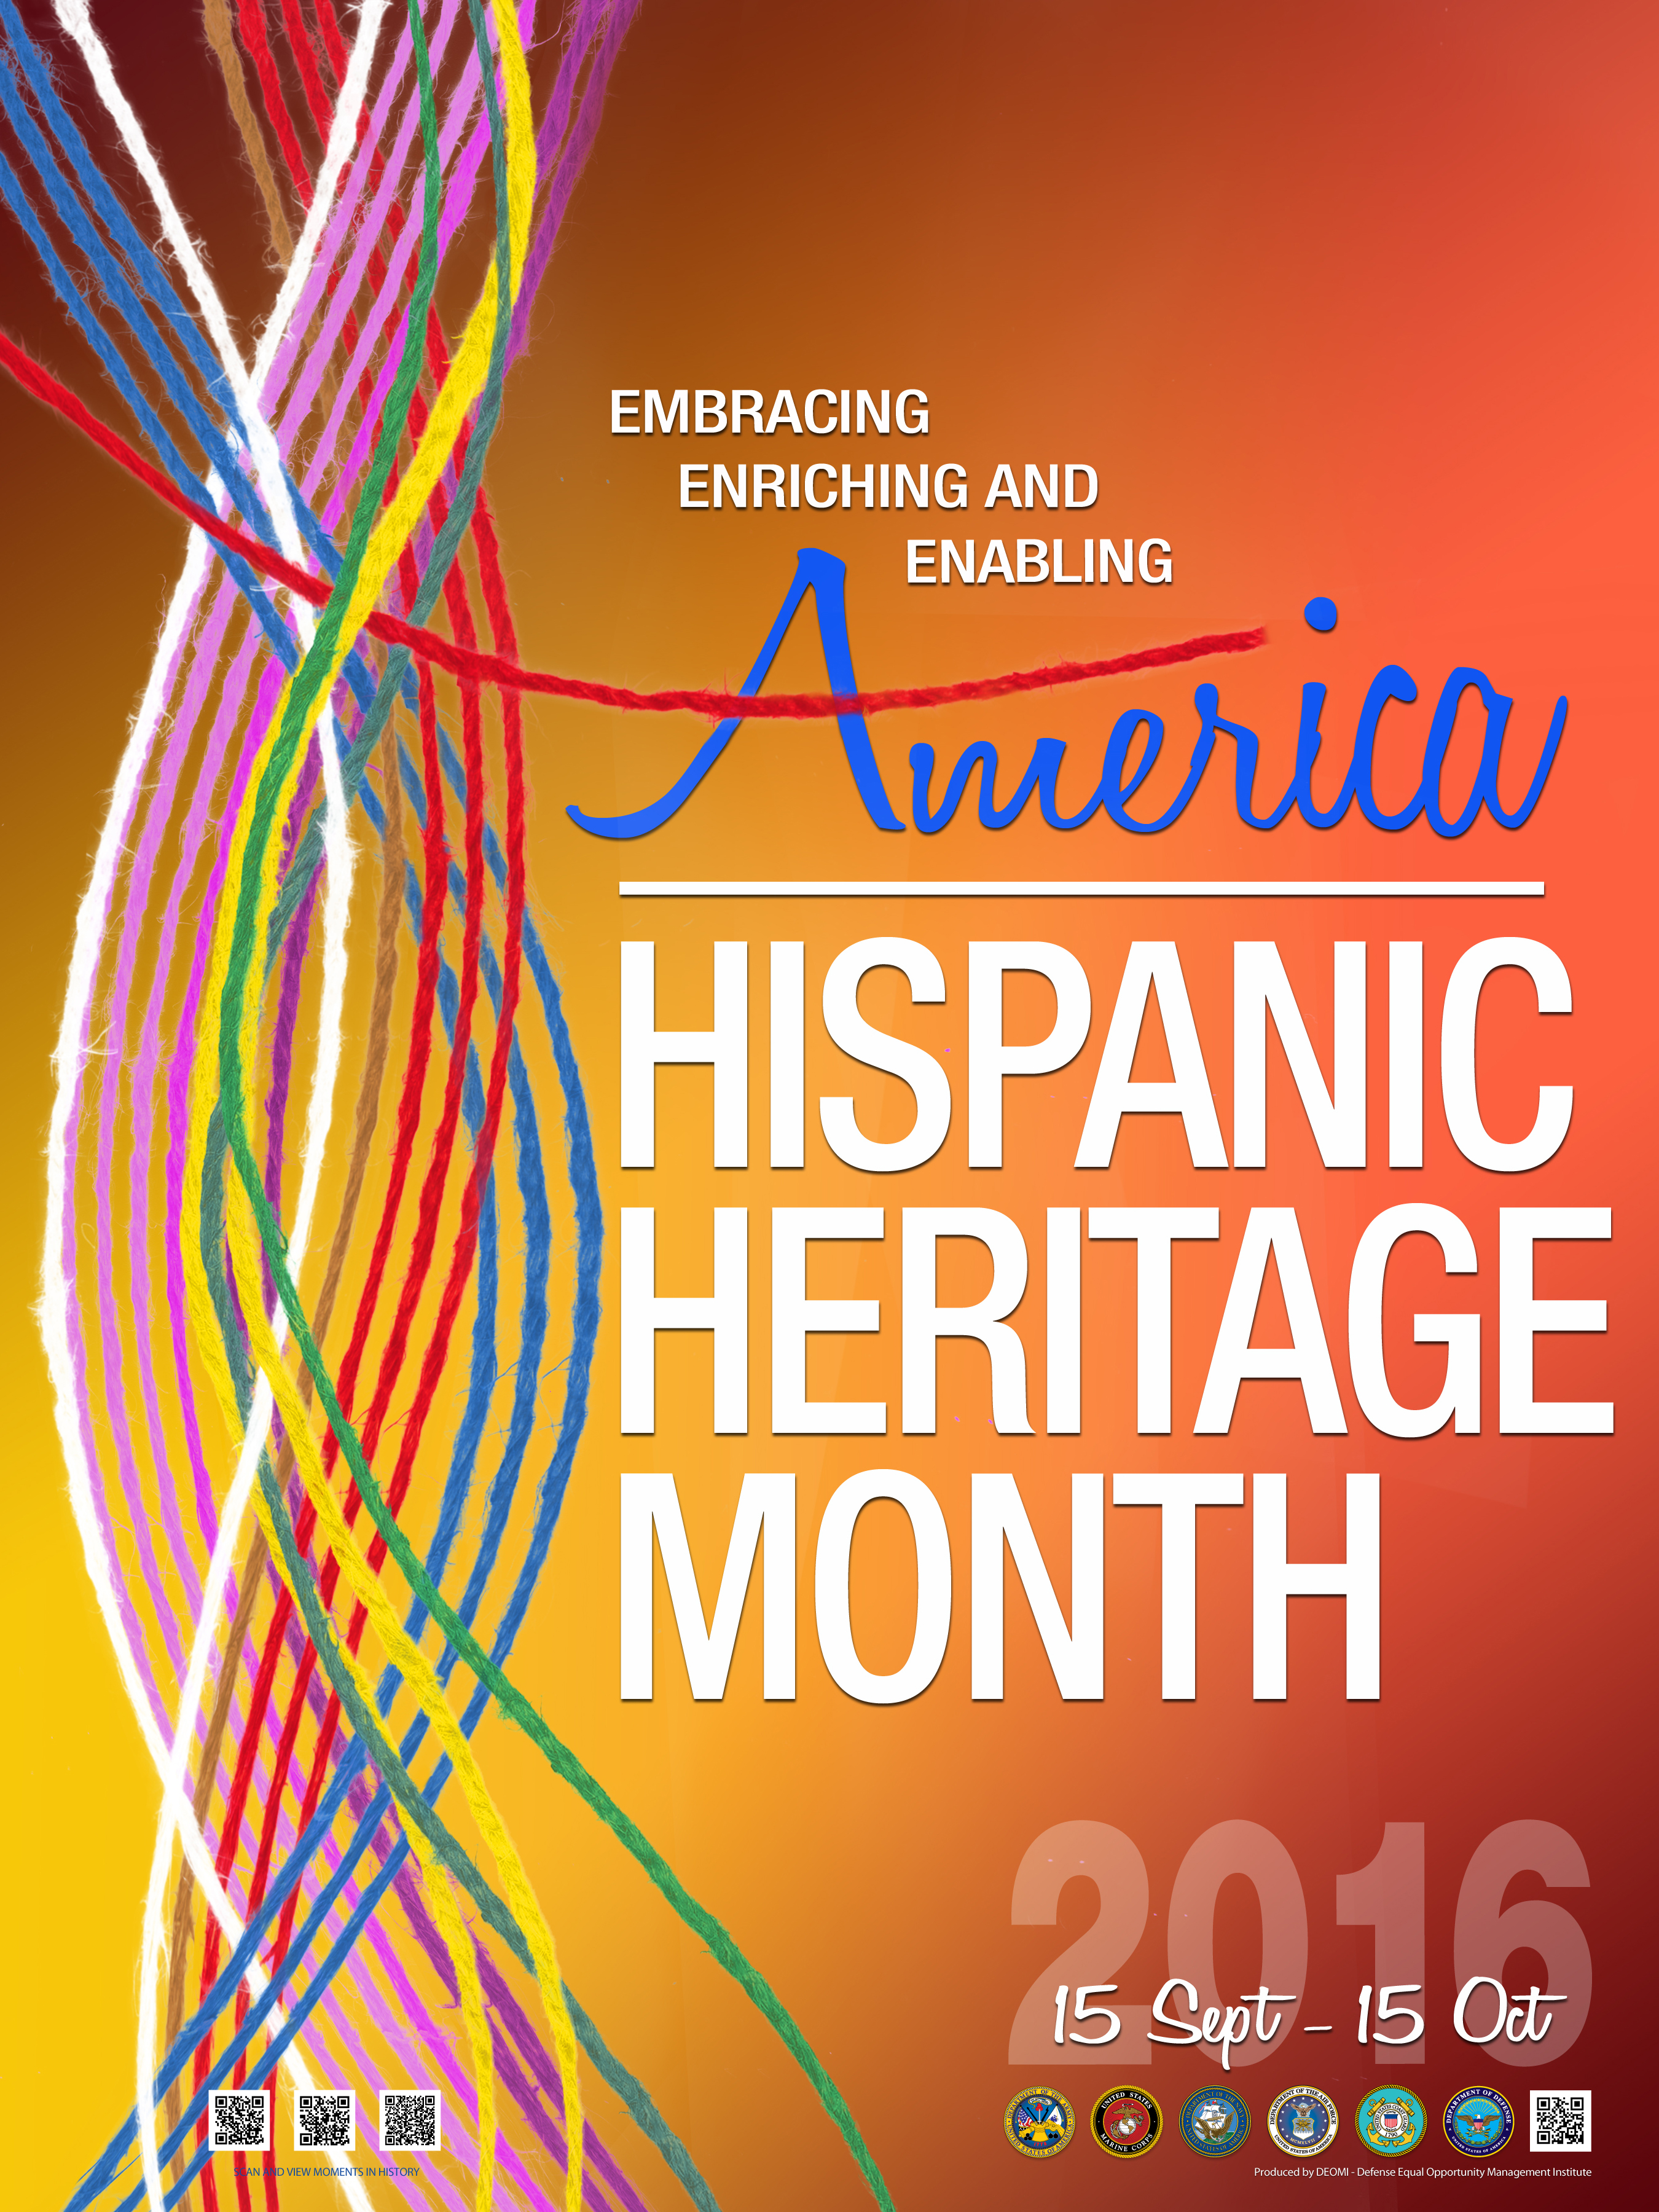 hispanic heritage month 2016 archive